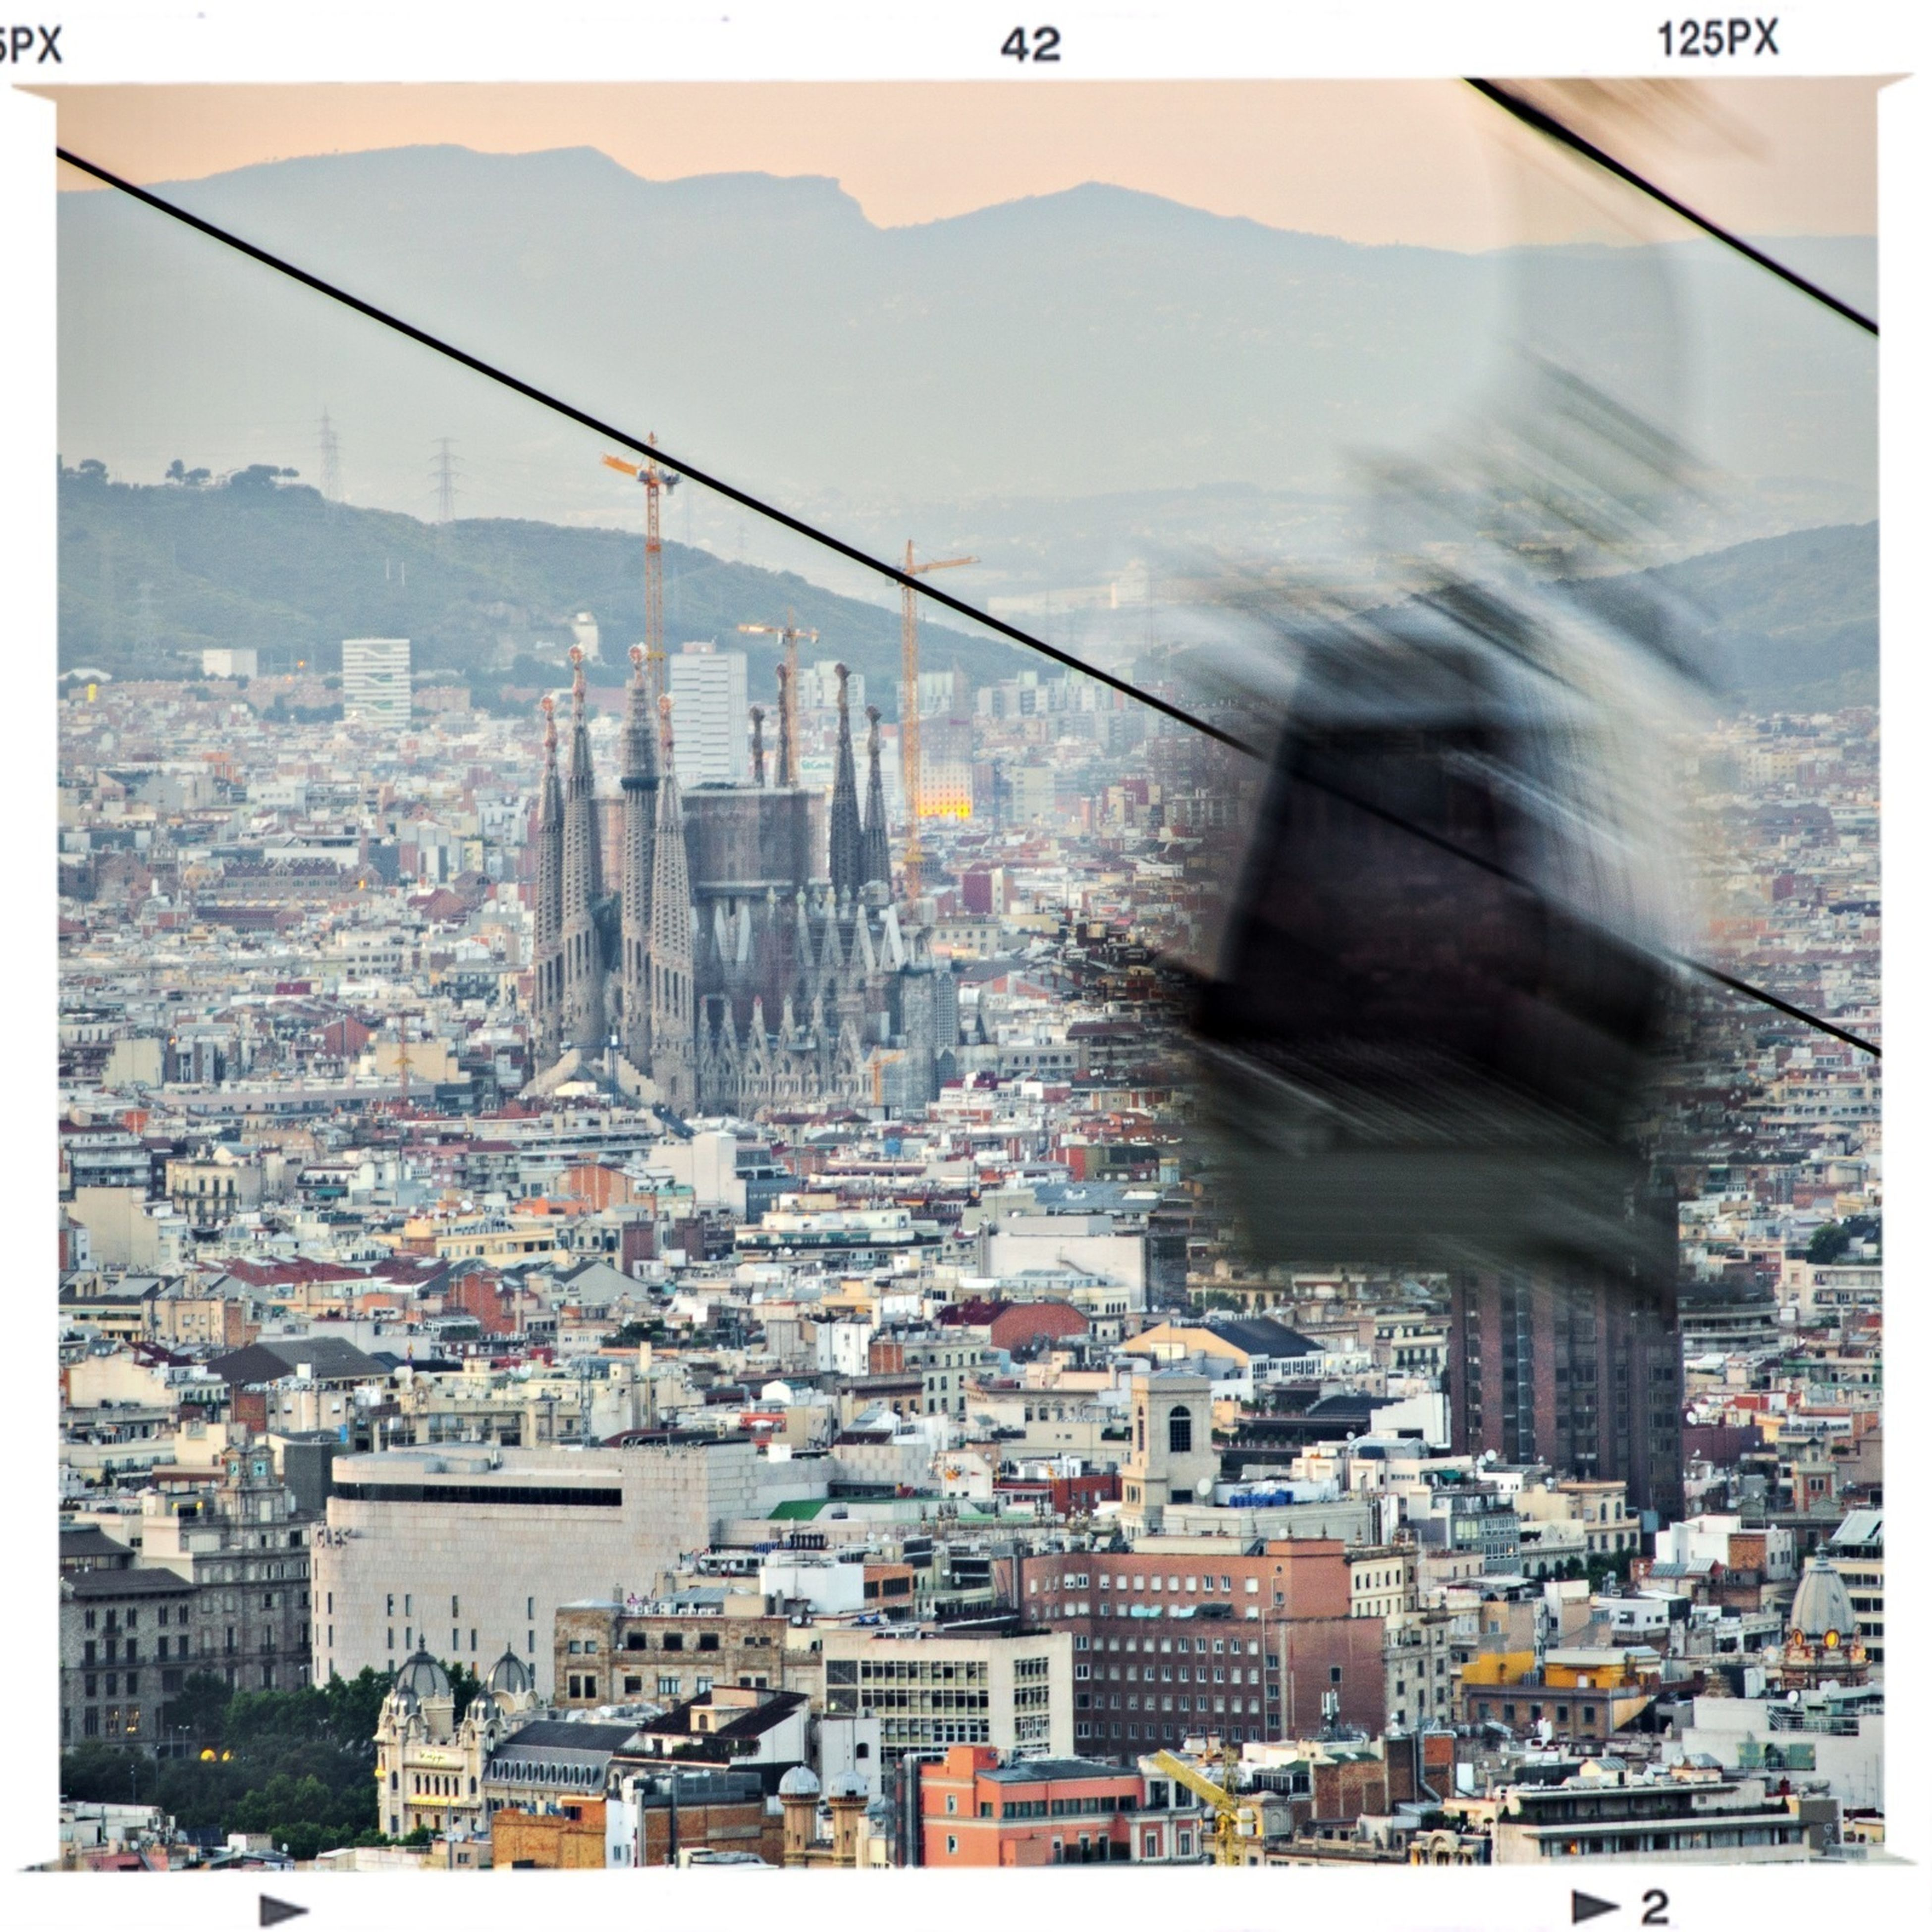 Schattenspiel  Barcelona skyline, Sagrada Familia views.